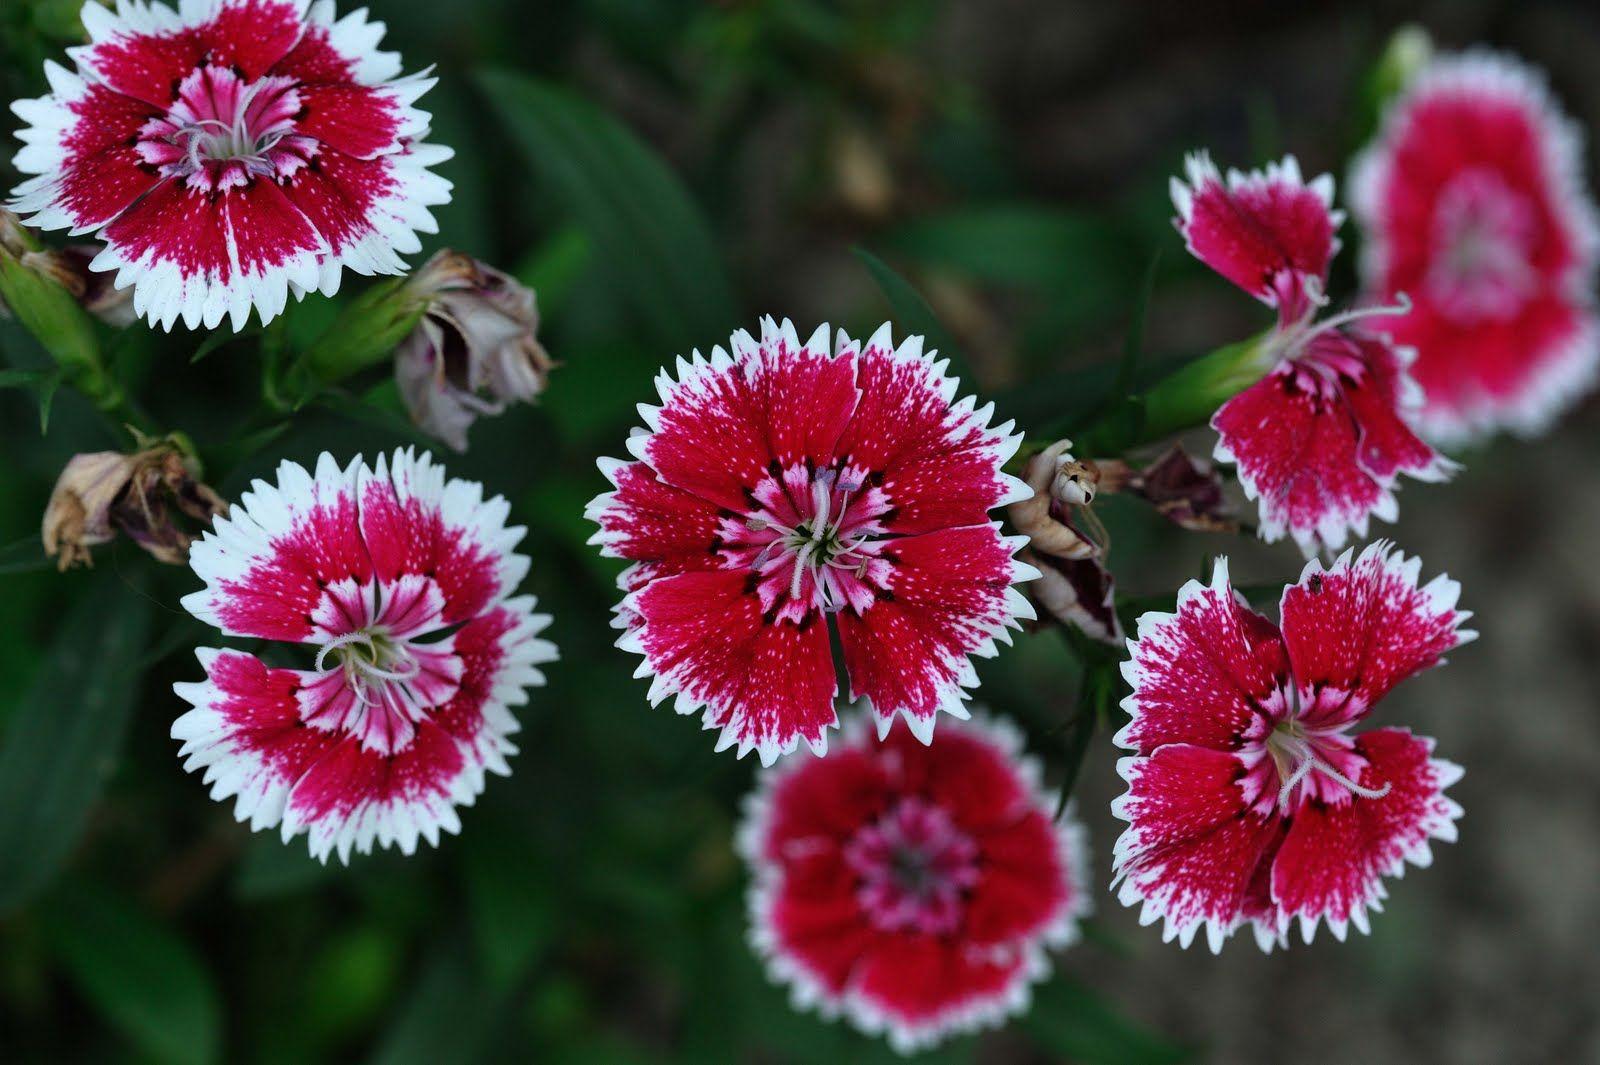 Gbb 2543 Jpg Image Sweet William Dianthus Barbatus Flowers